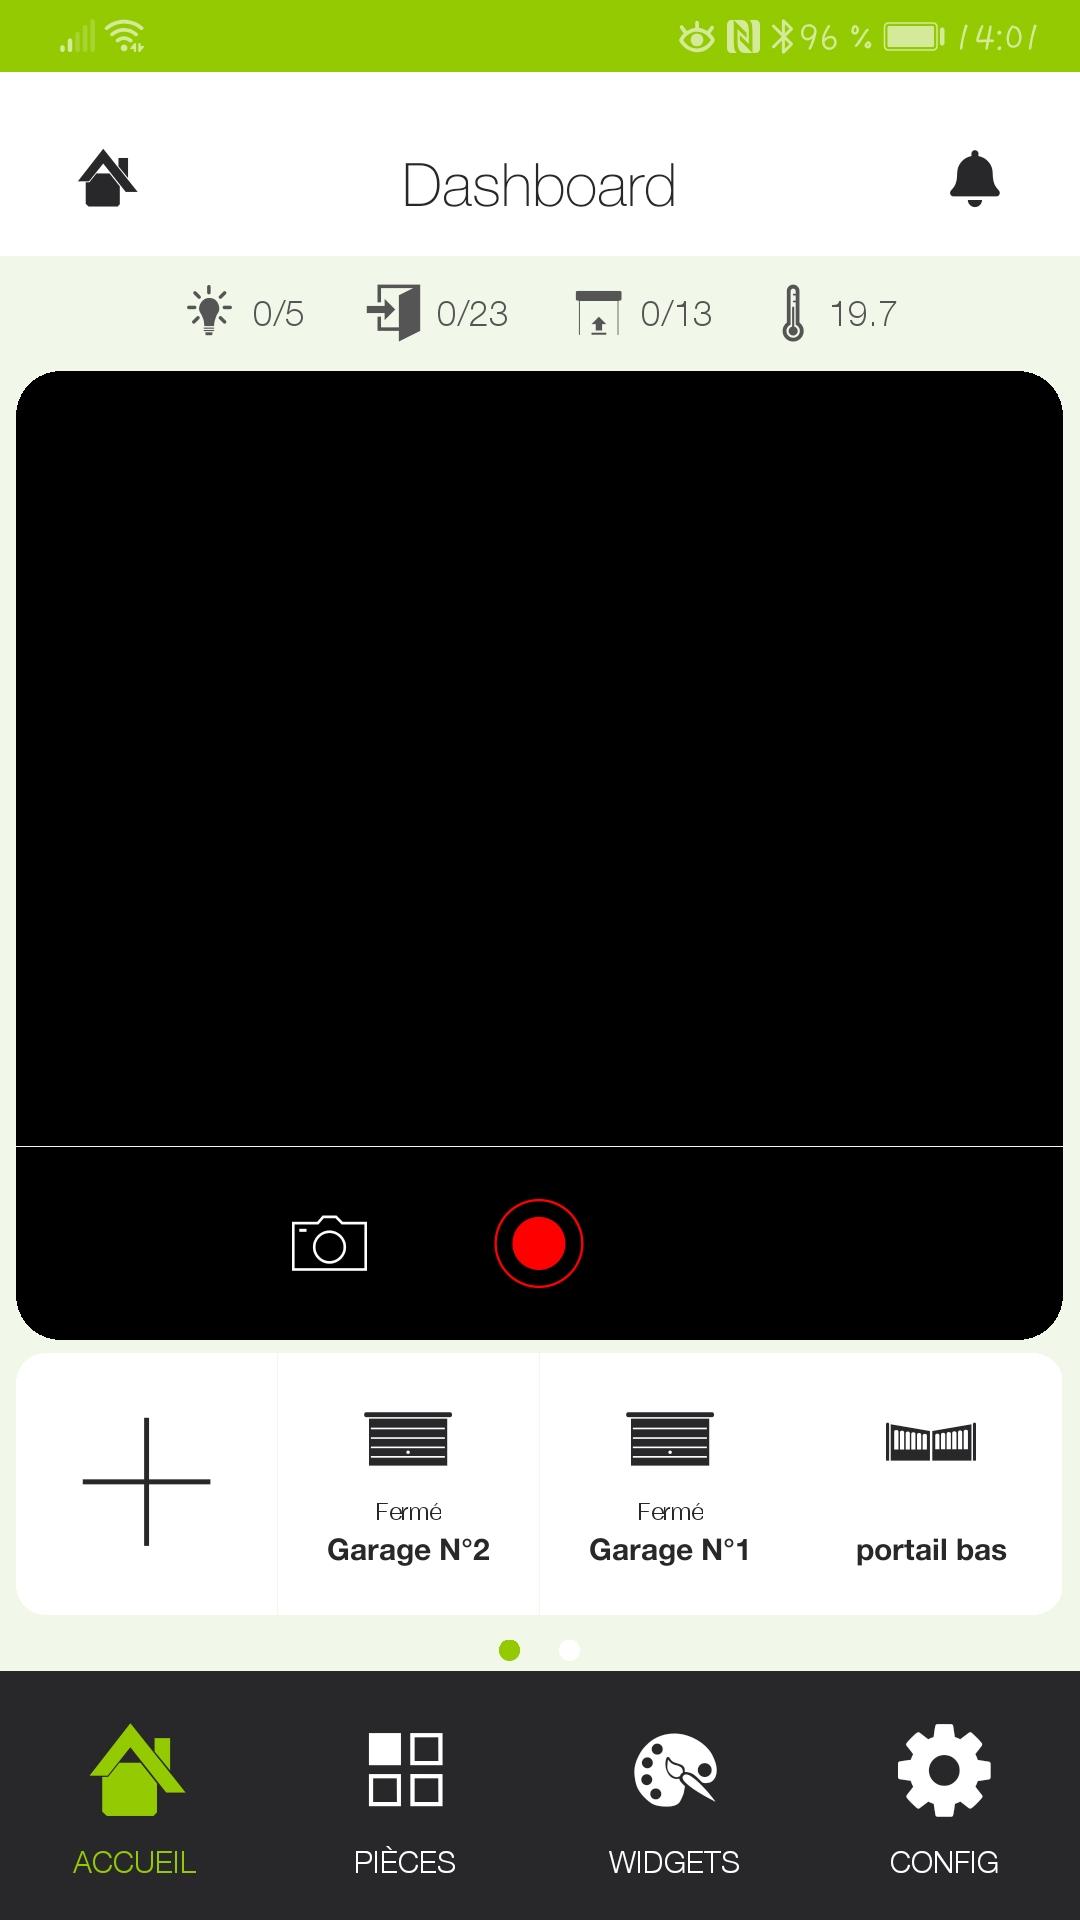 Screenshot_20200318_140126_fr.jeedom.jeedom